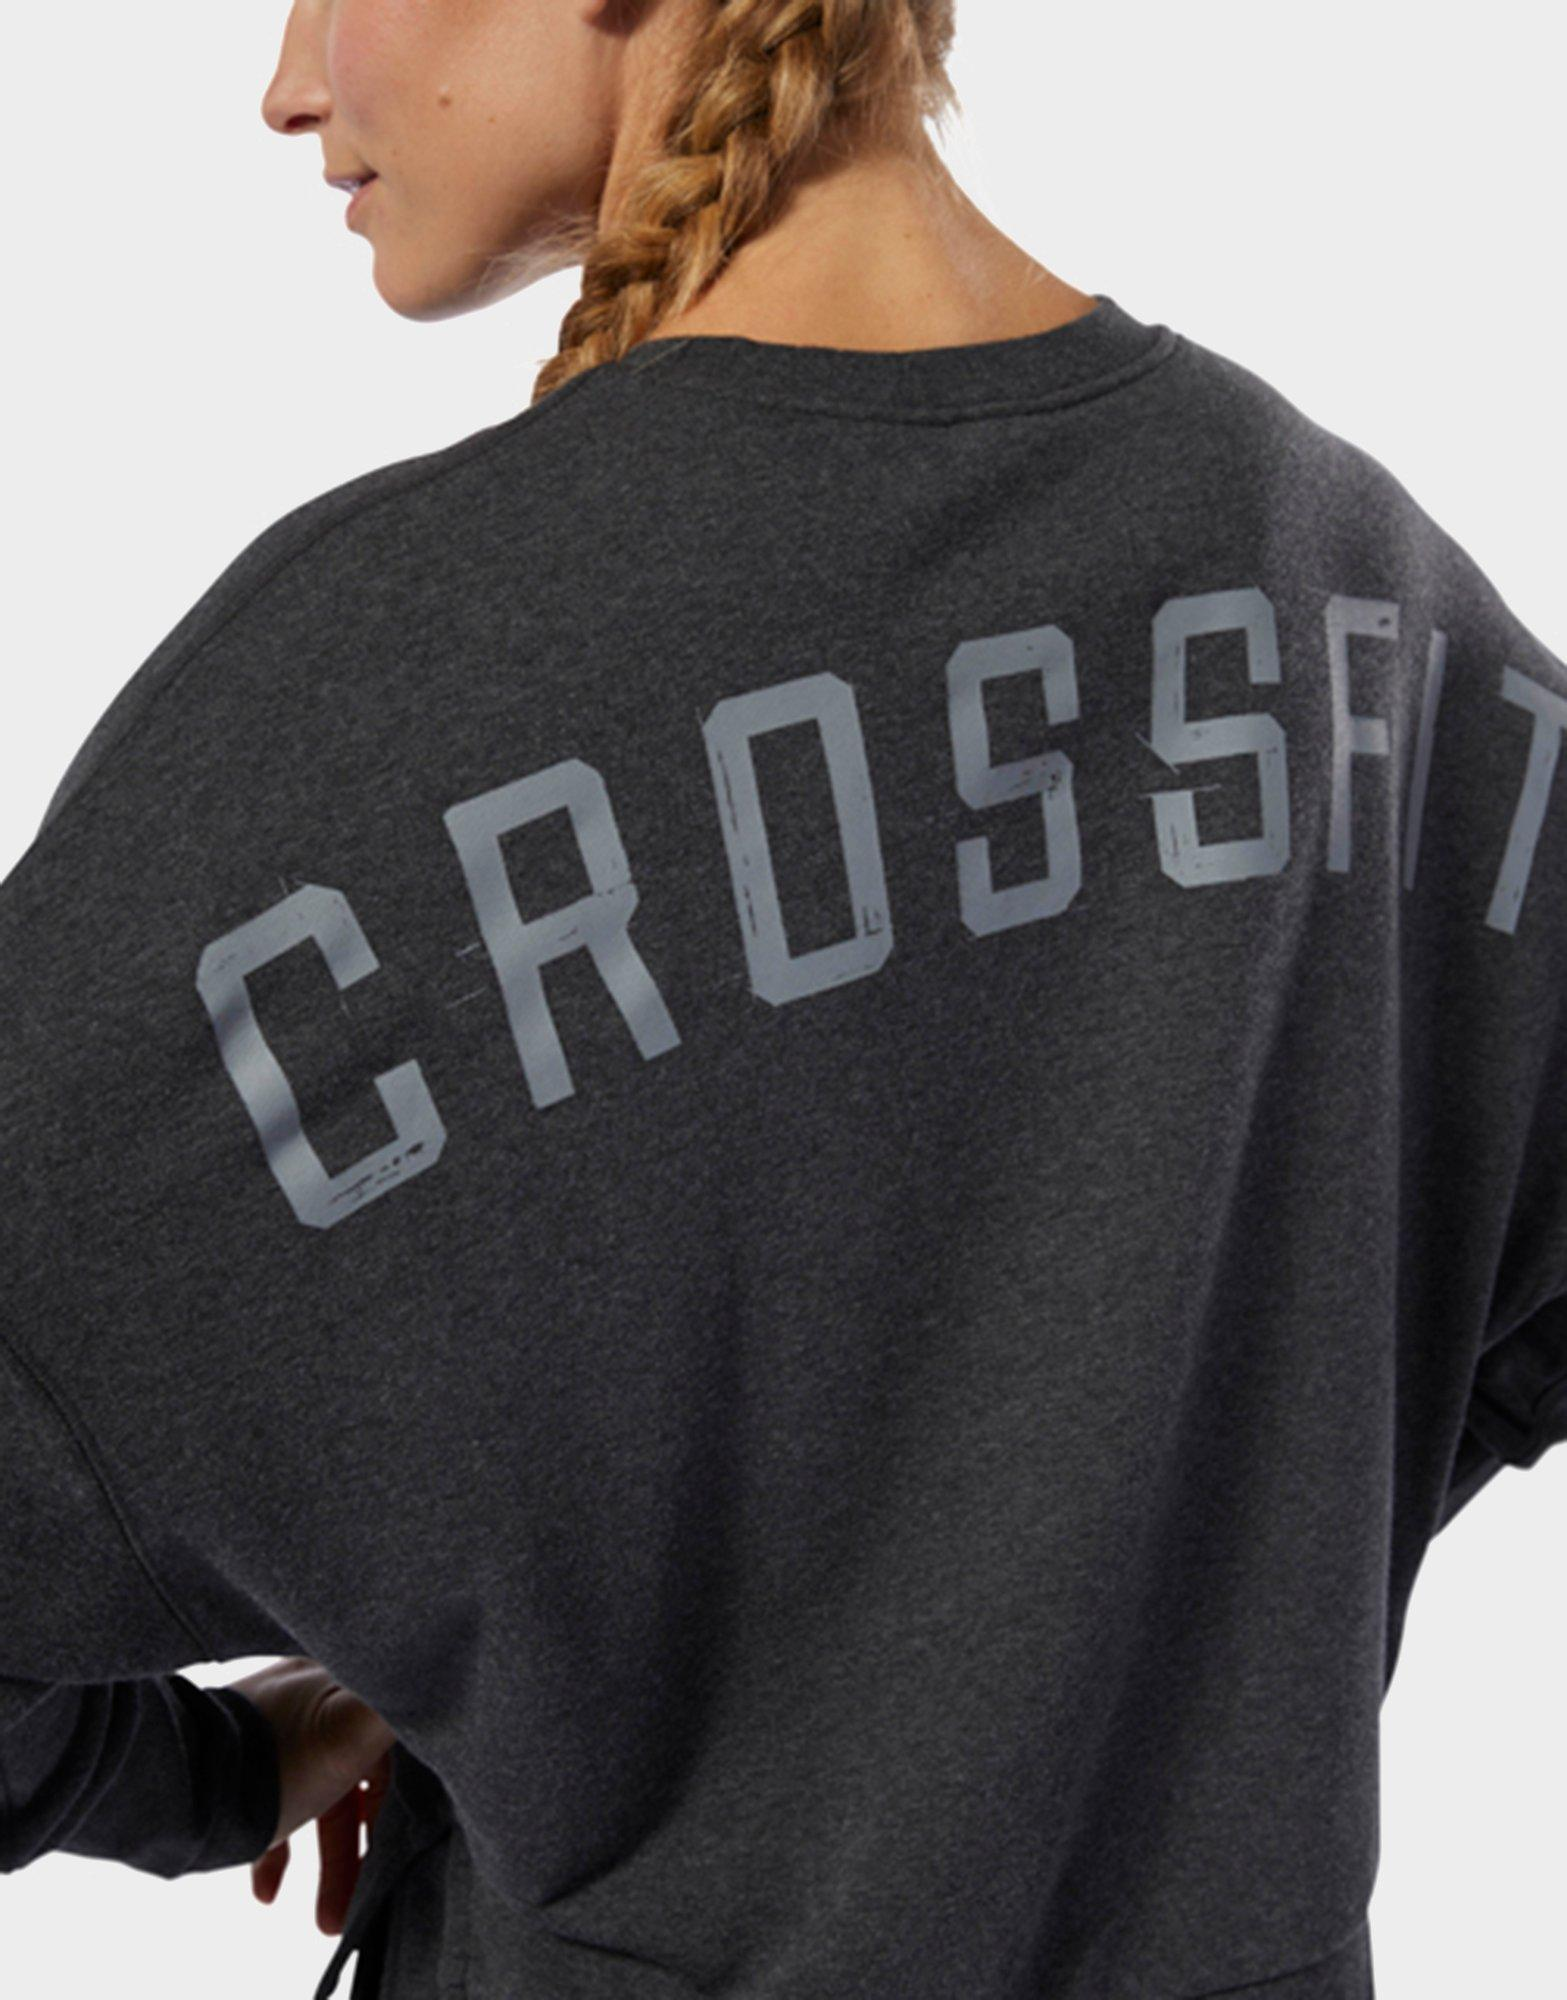 8fb344ef Reebok - Black Crossfit Terry Crew Sweatshirt - Lyst. View fullscreen